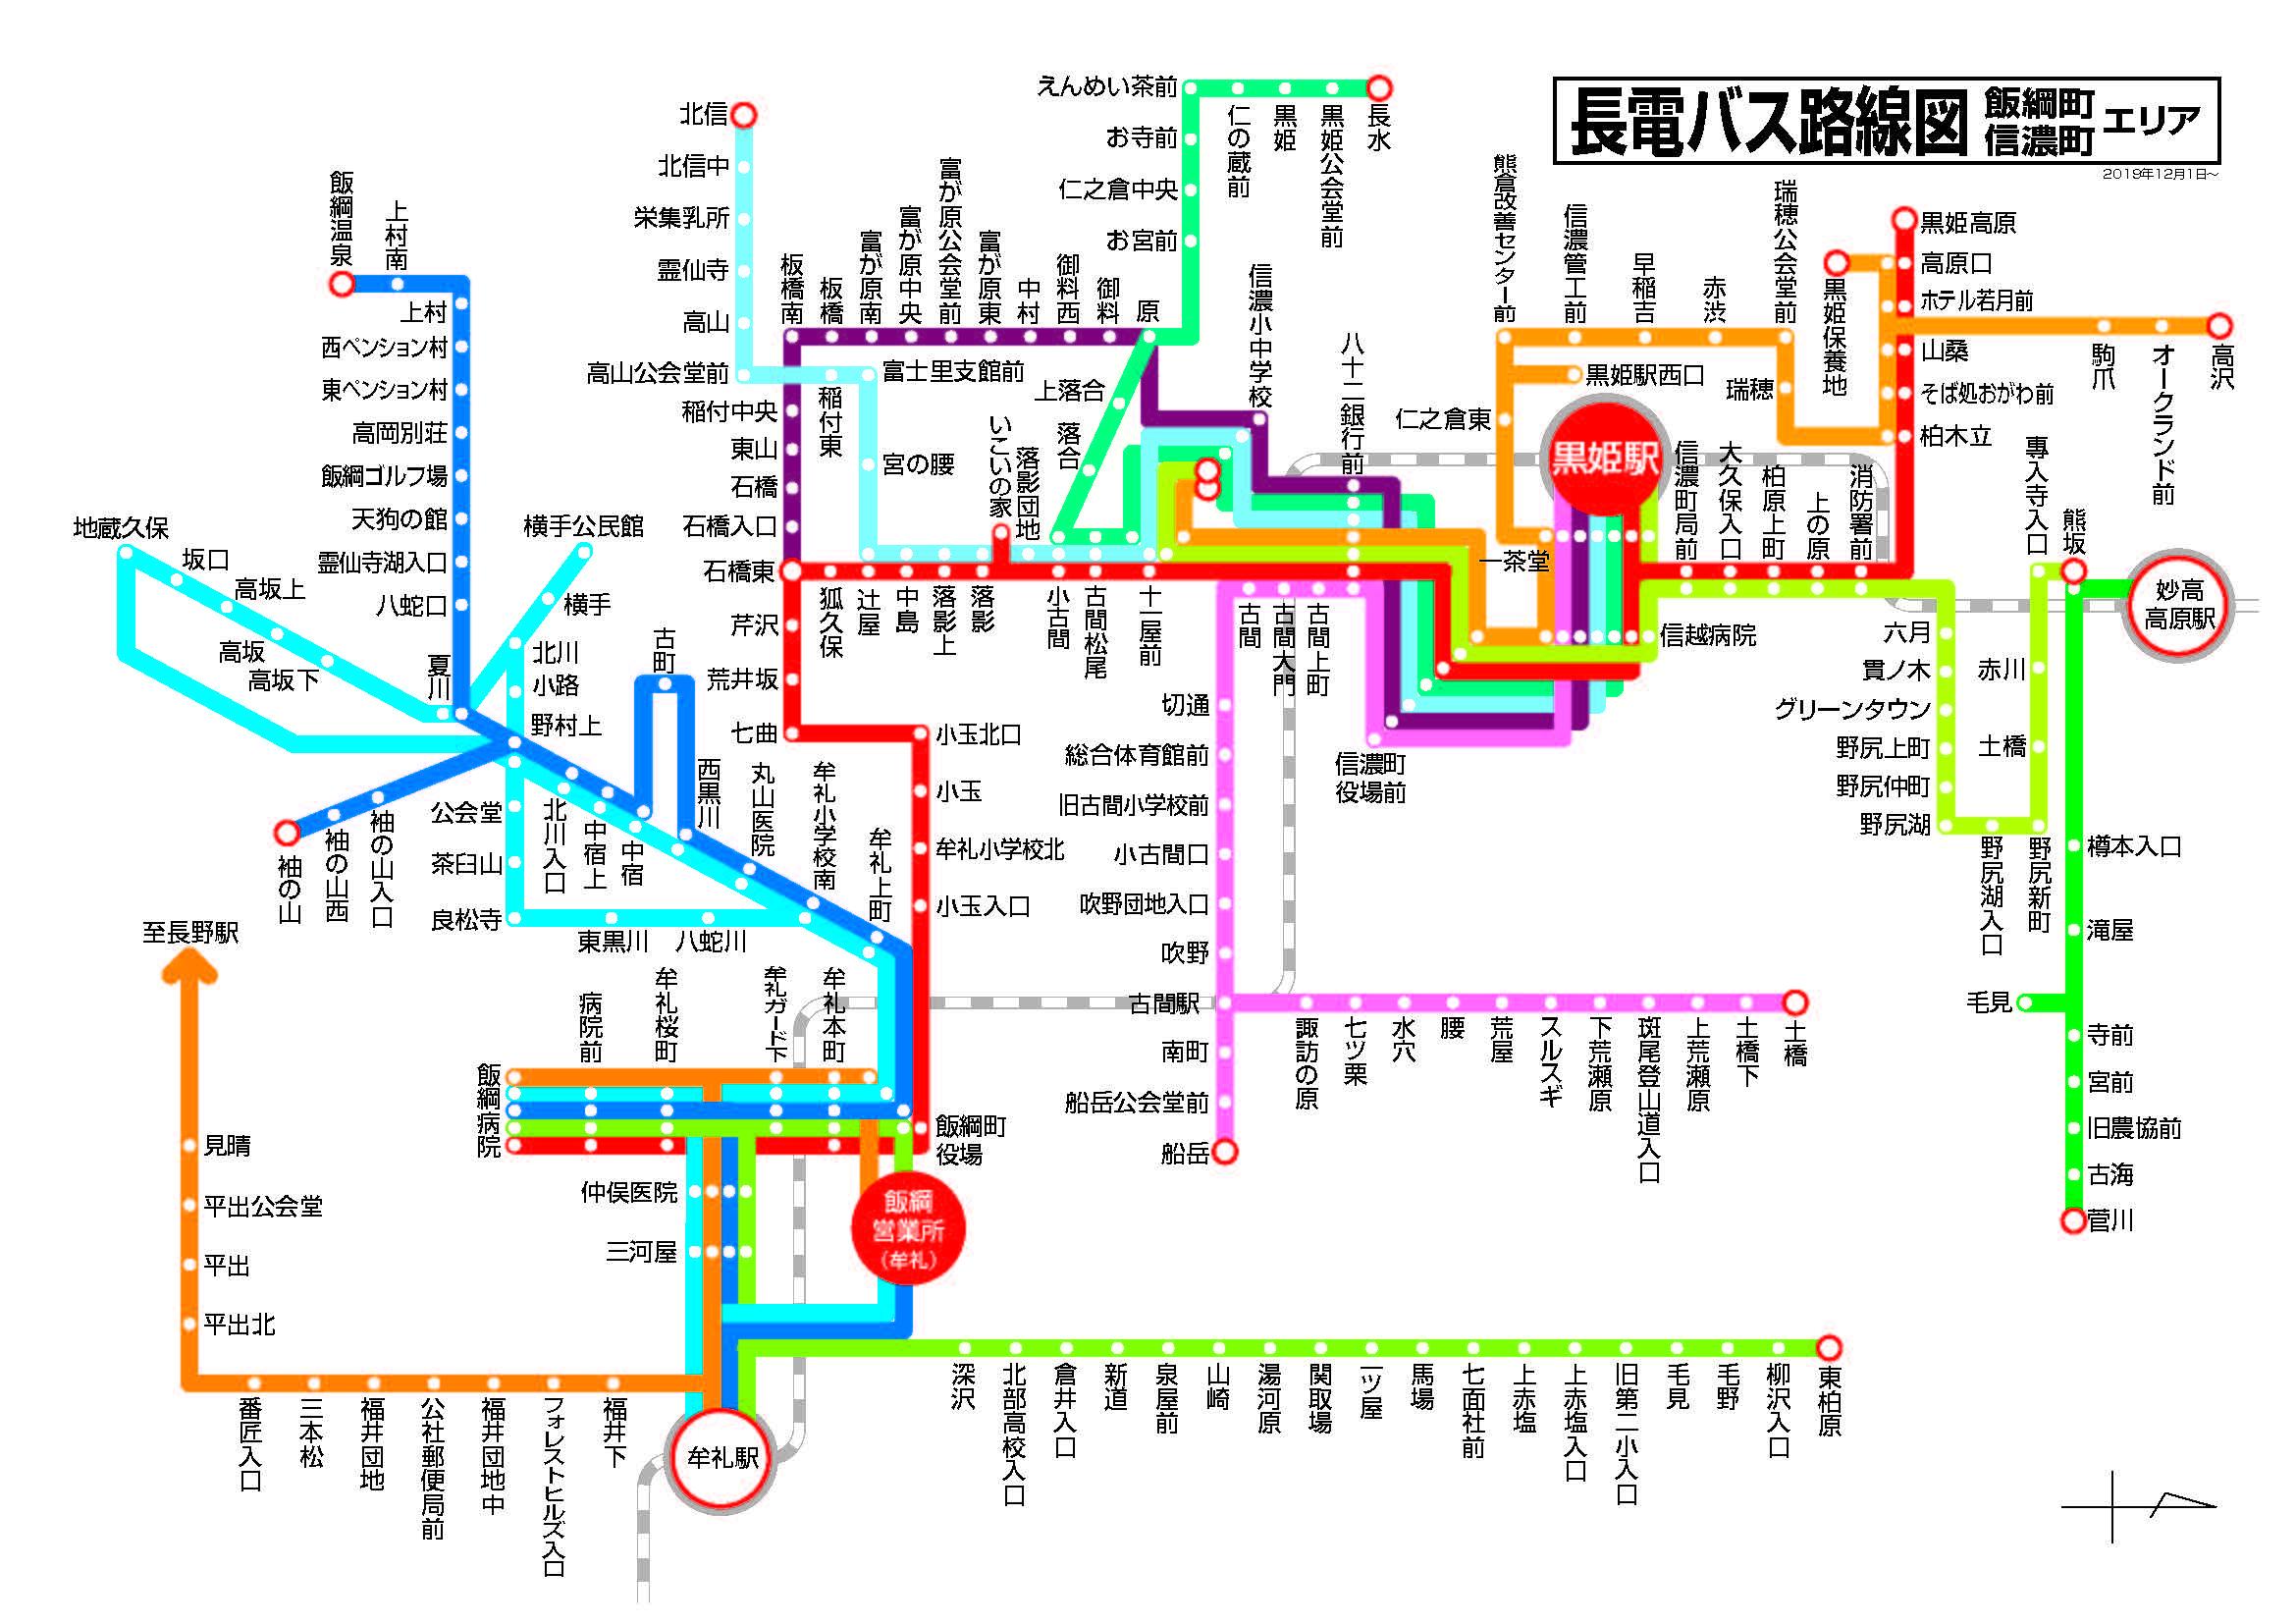 Iizuna-machi, Shinanomachi area